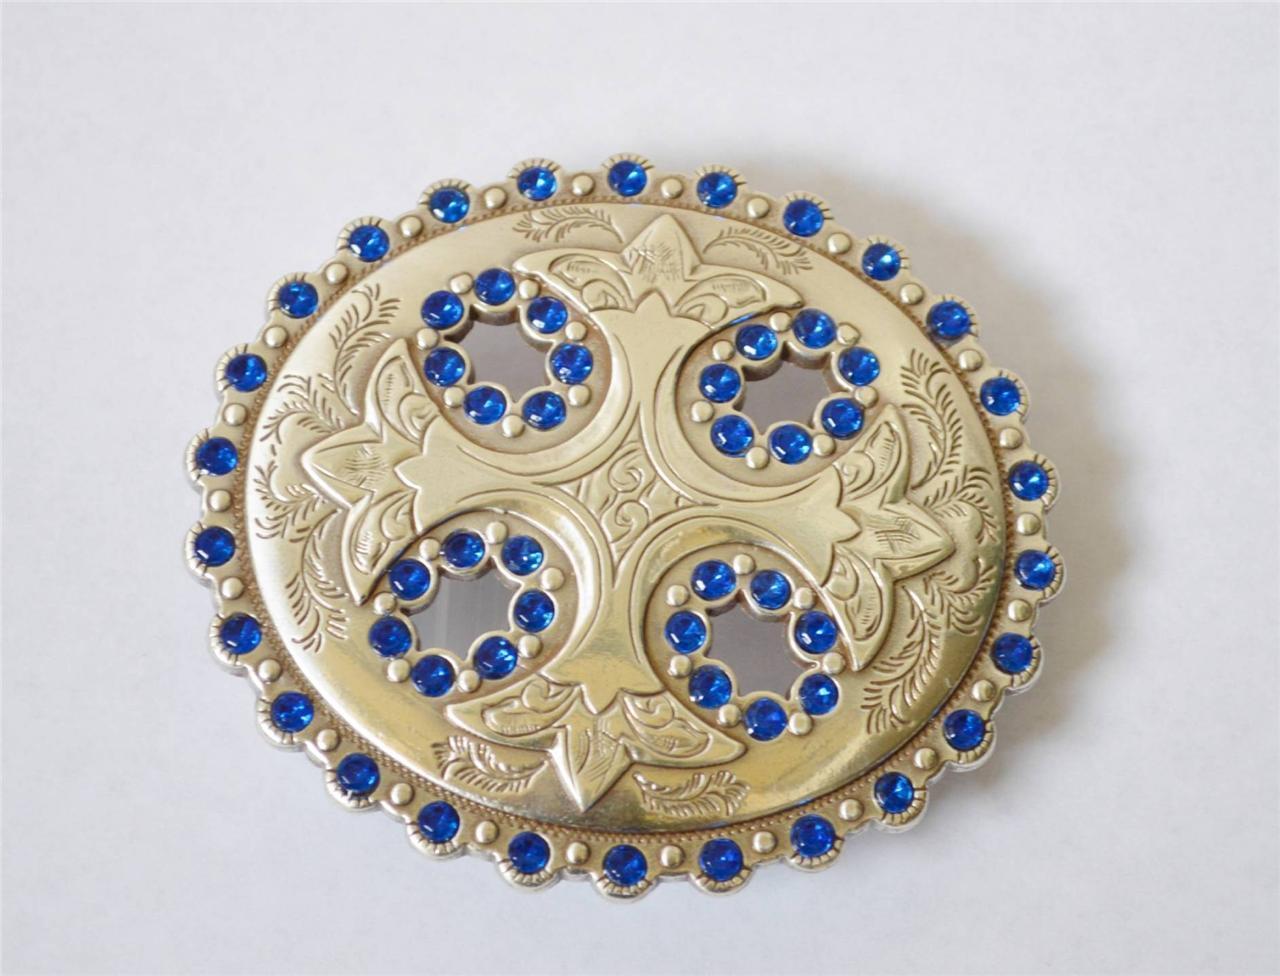 Enmon Engraved Blue Rhinestone Cross Western Belt Buckle Cowgirl Silver Round